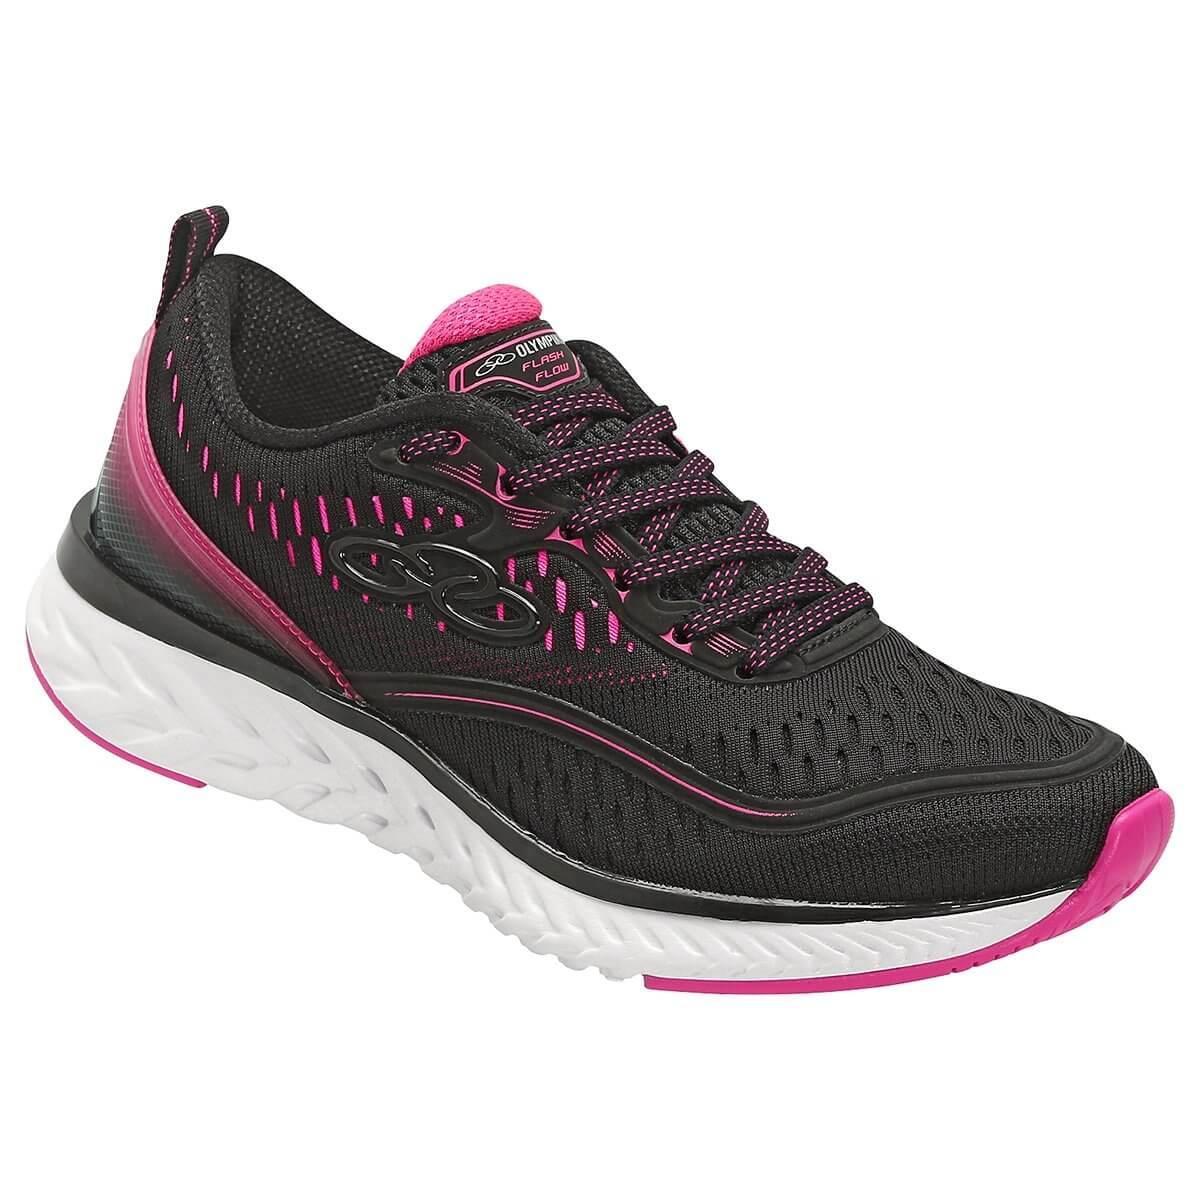 1d06017a26 Tênis Feminino Olympikus Flash Flow 556 - Preto Pink - Calçados ...